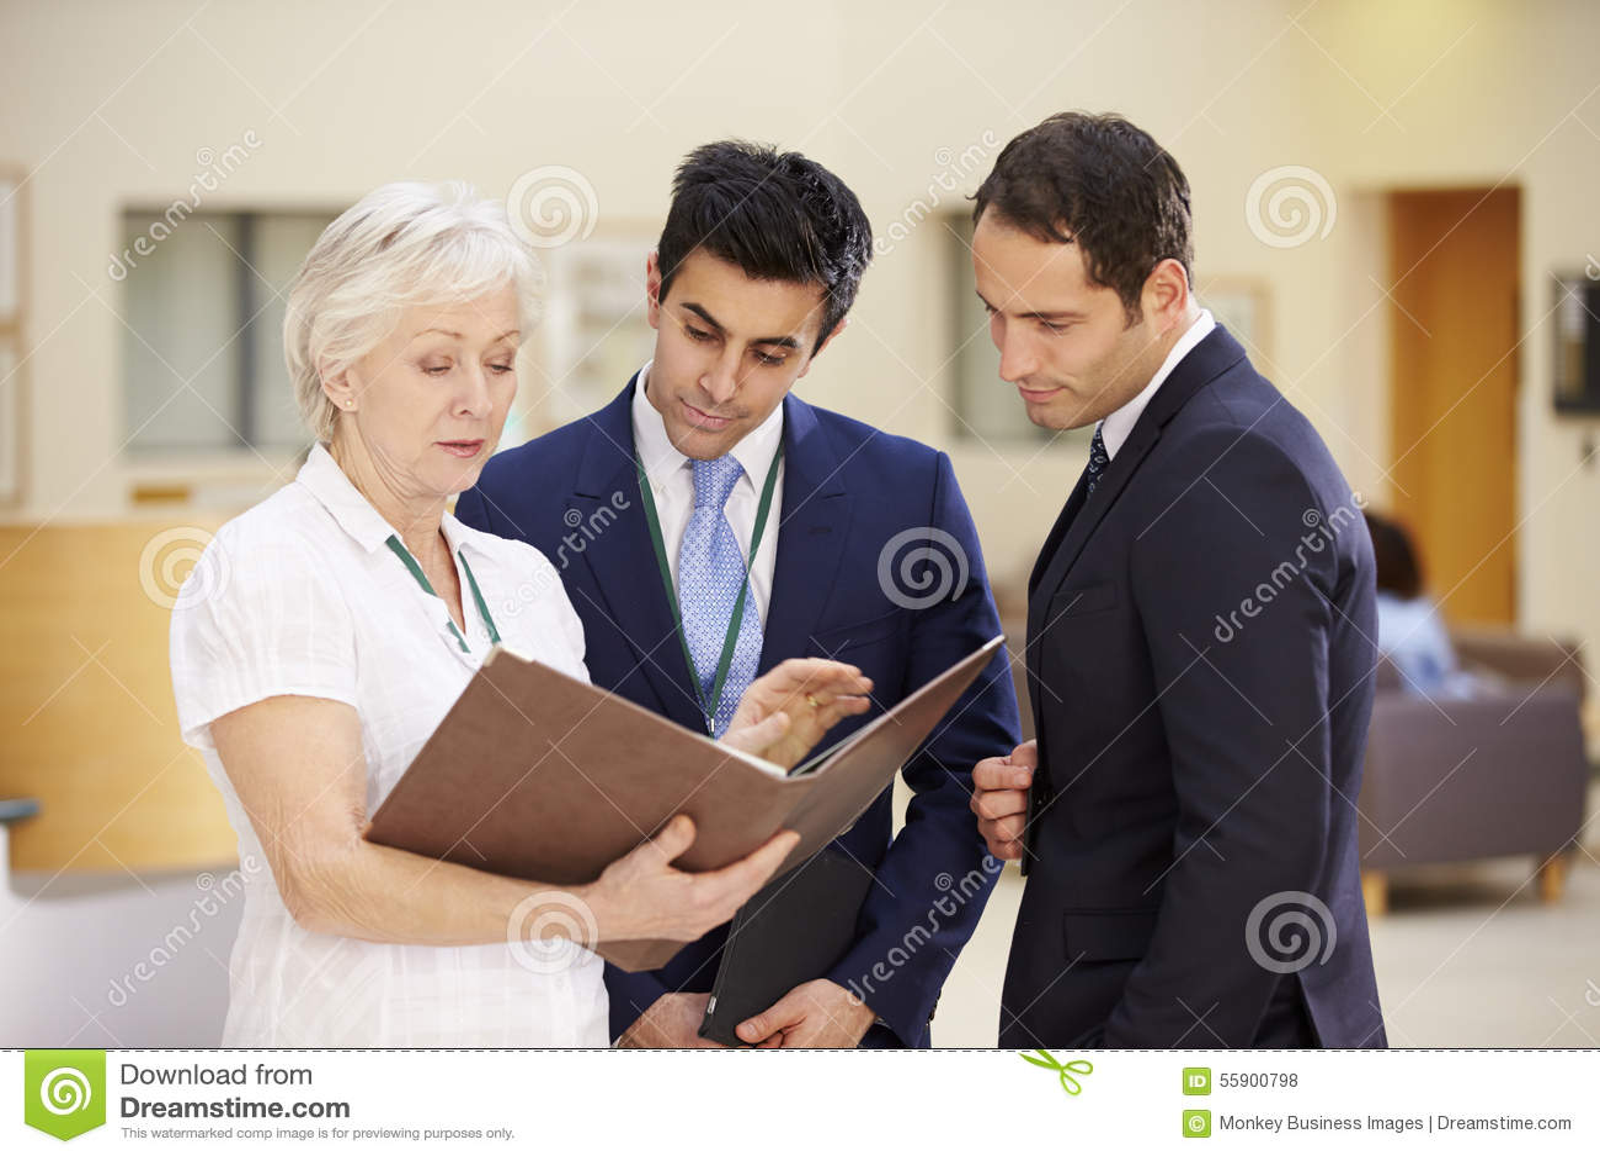 Tres consultores que discuten notas pacientes en hospital